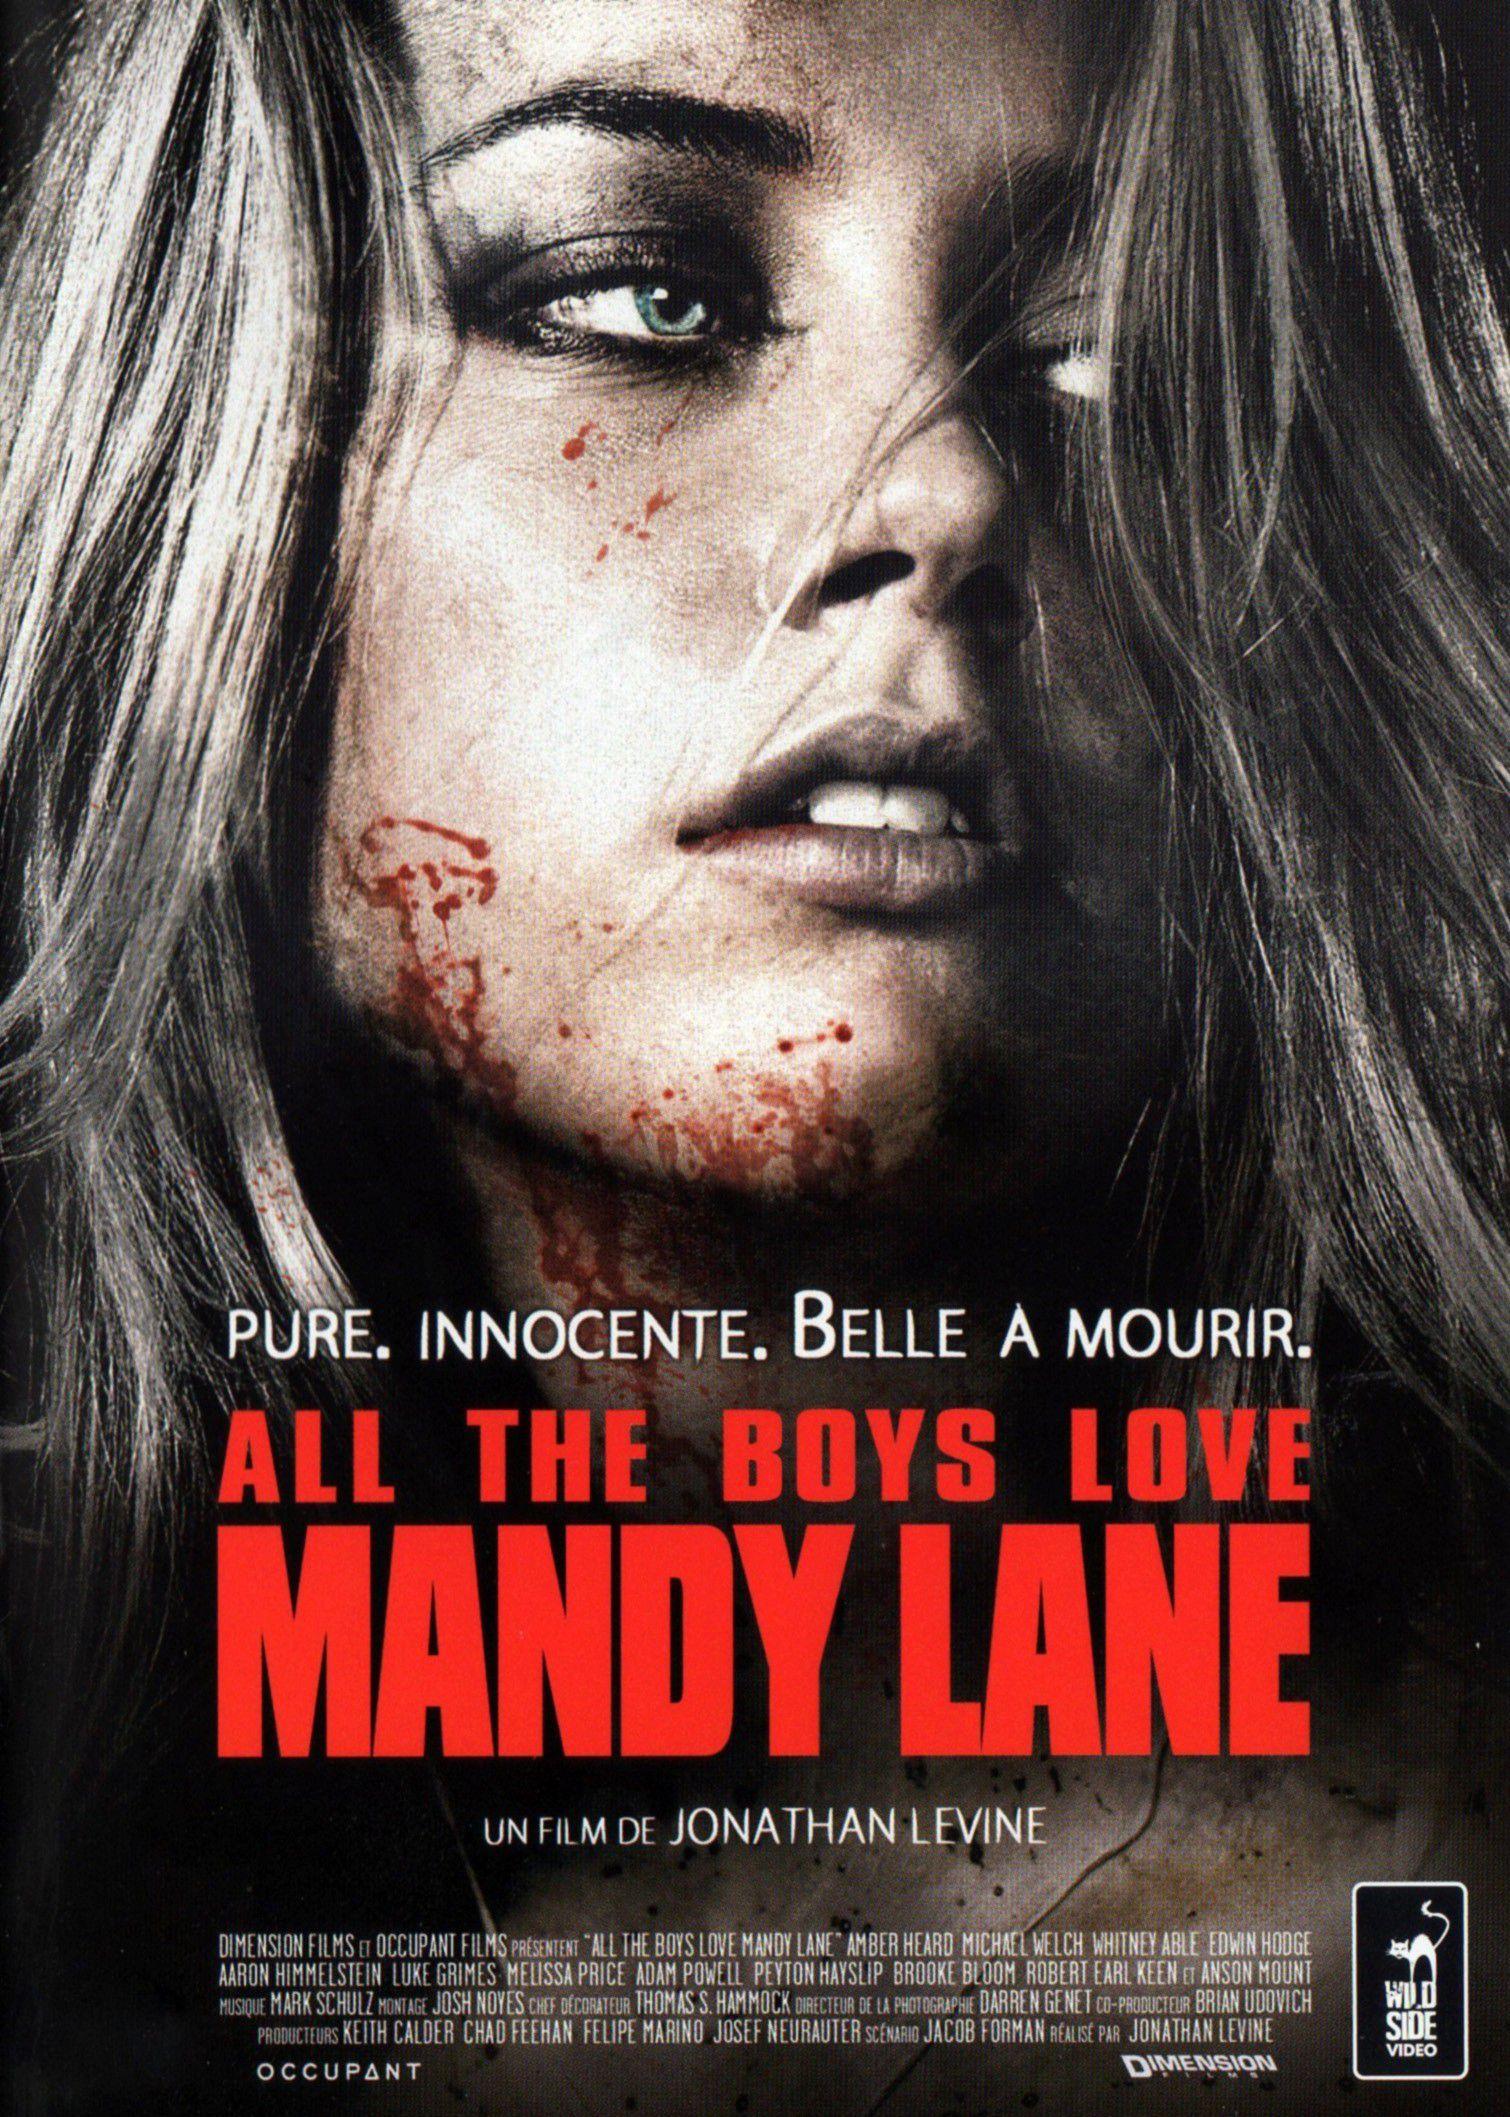 All the Boys Love Mandy Lane - Film (2008)